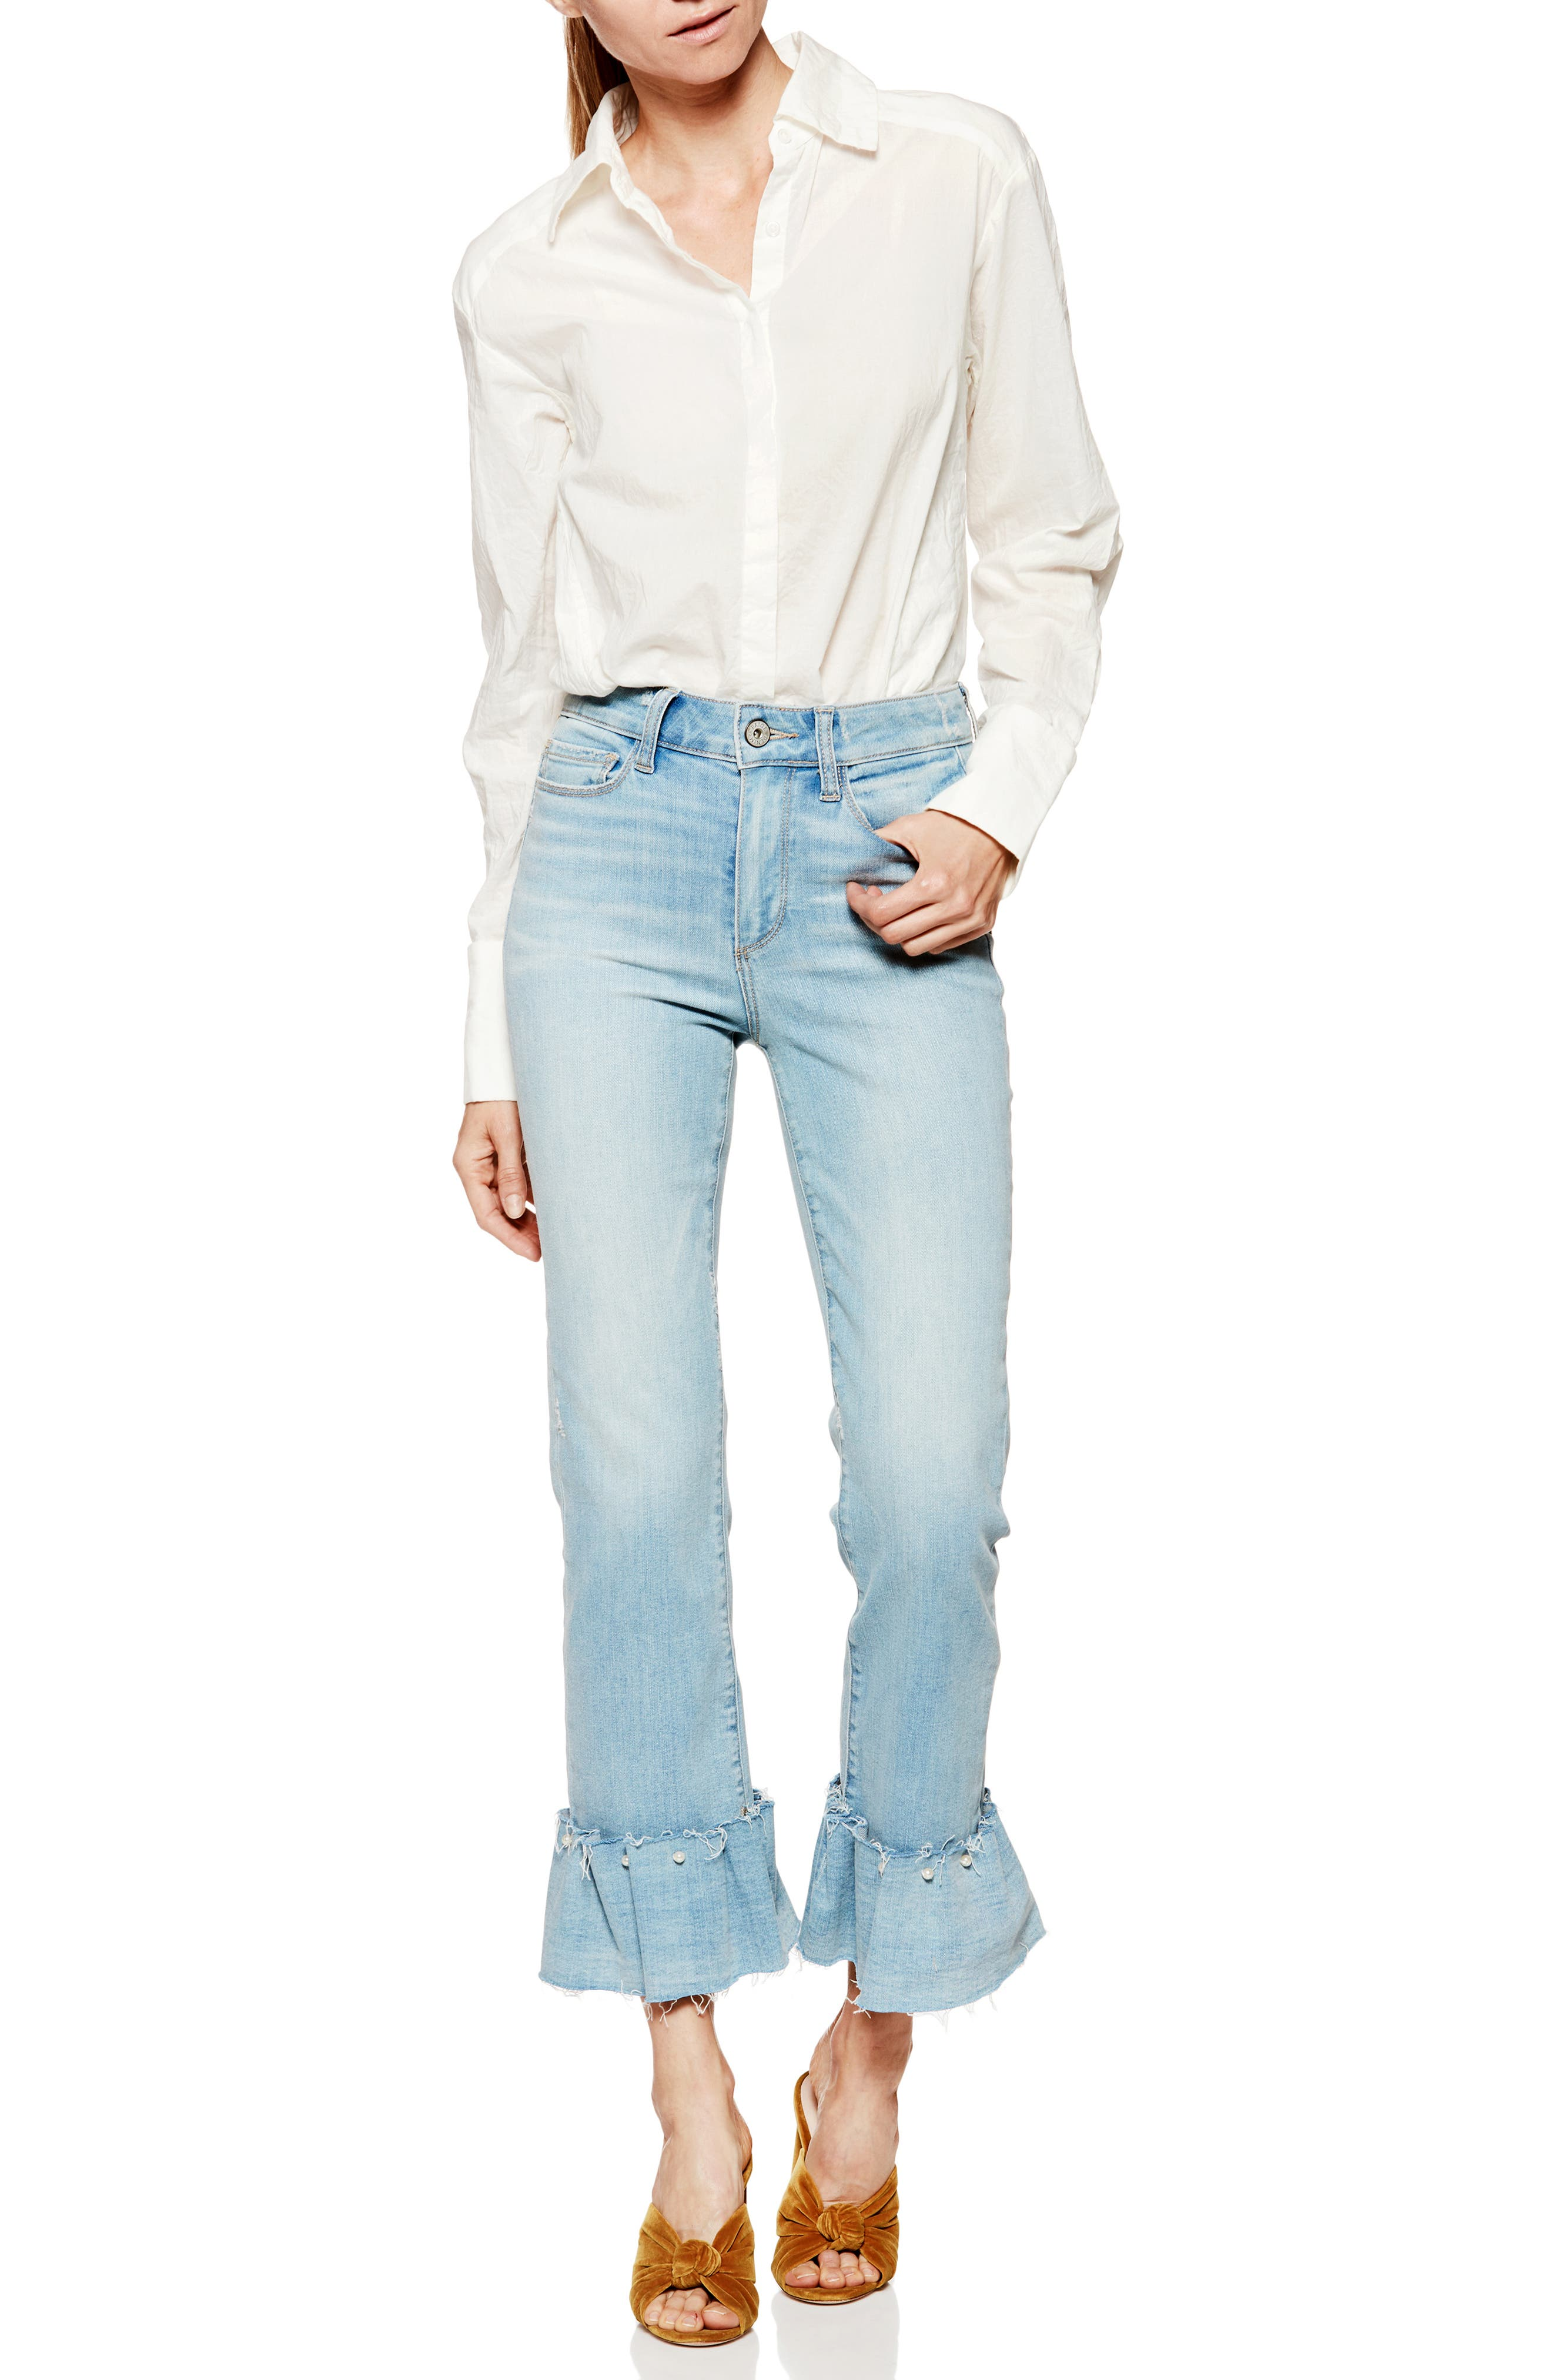 Transcend Vintage - Hoxton Embellished Ruffle High Waist Jeans,                             Alternate thumbnail 3, color,                             Palms